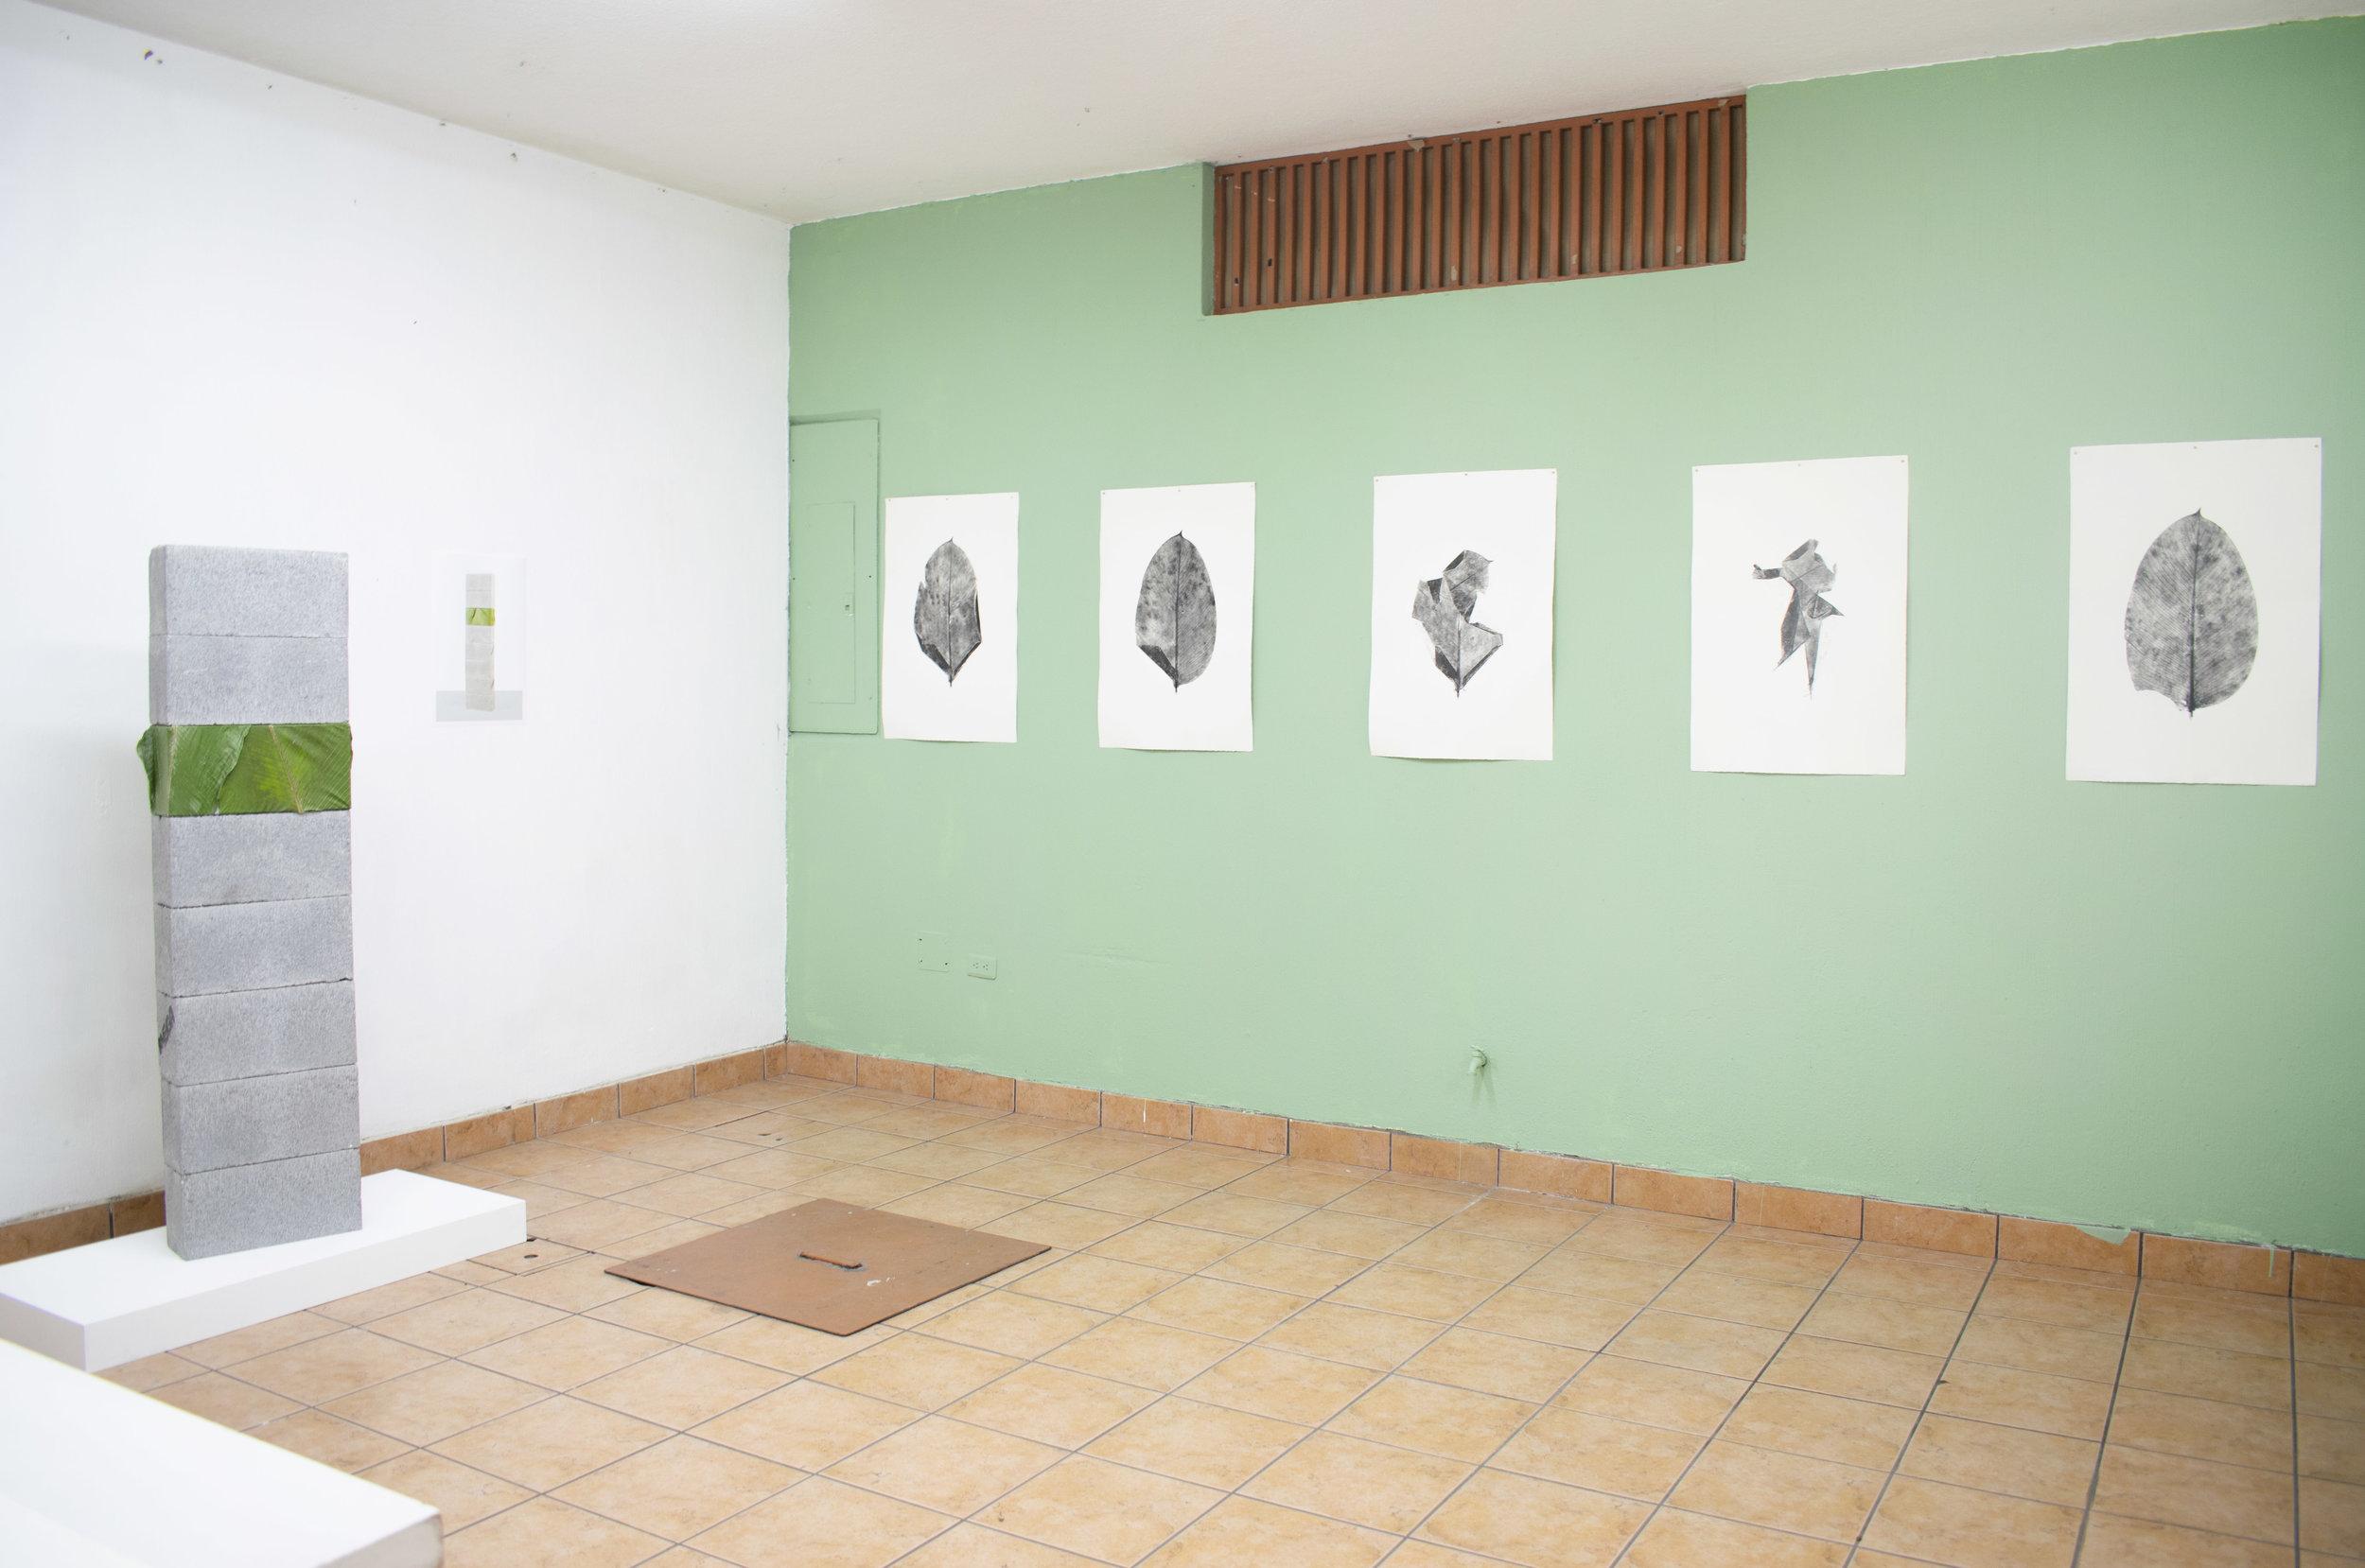 yavheni de leon - project room 4.jpg